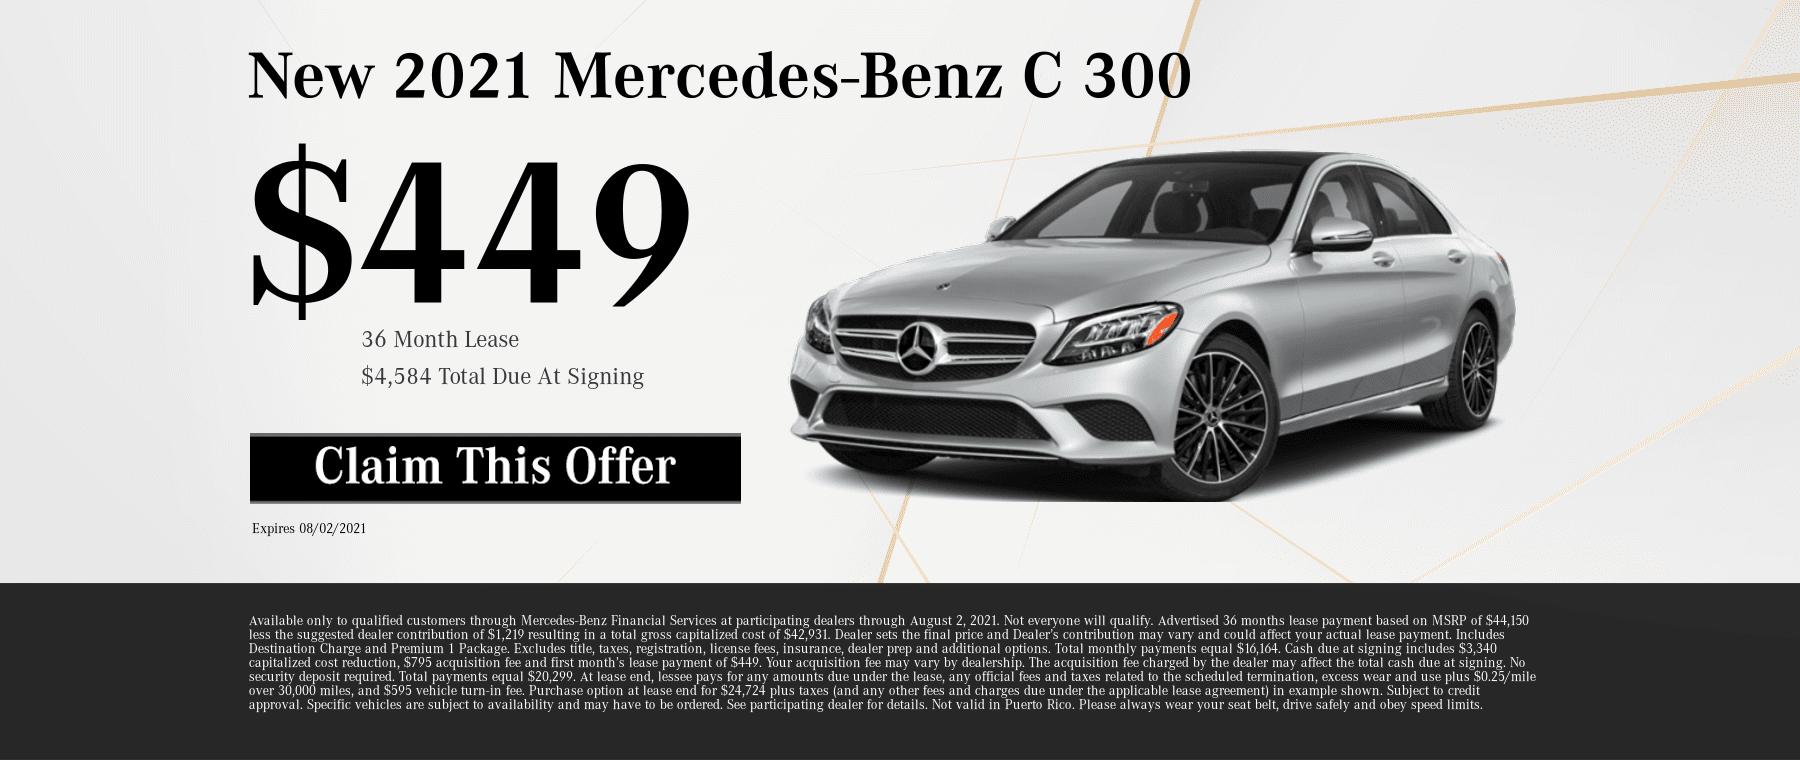 2021-Mercedes-Benz-C 300-Sedan-85